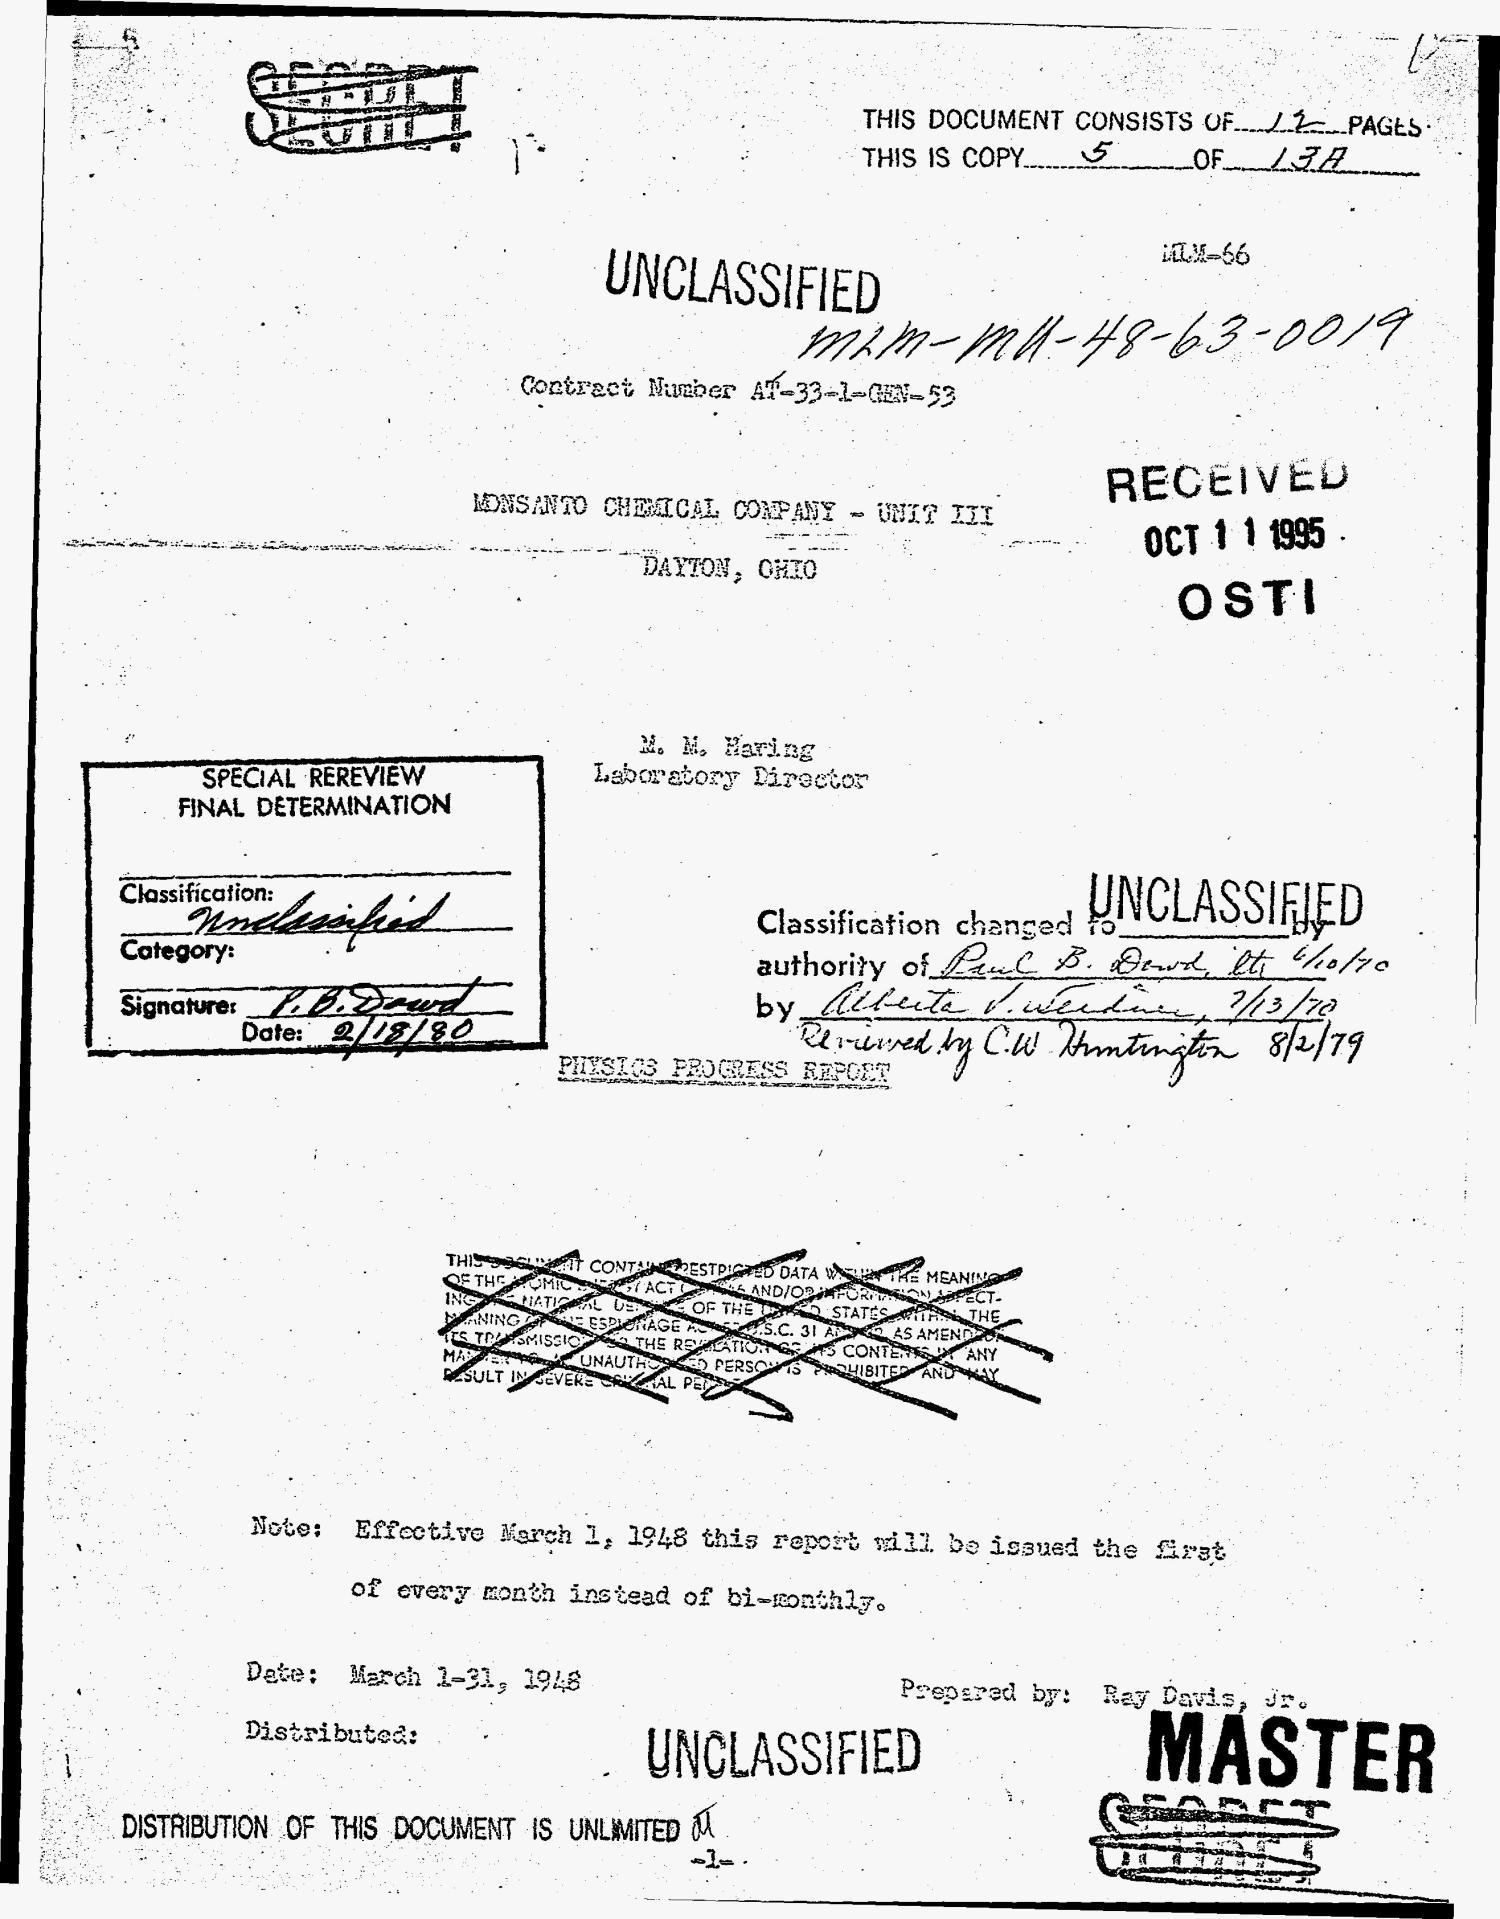 Physics progress report, March 1--31, 1948 - Digital Library